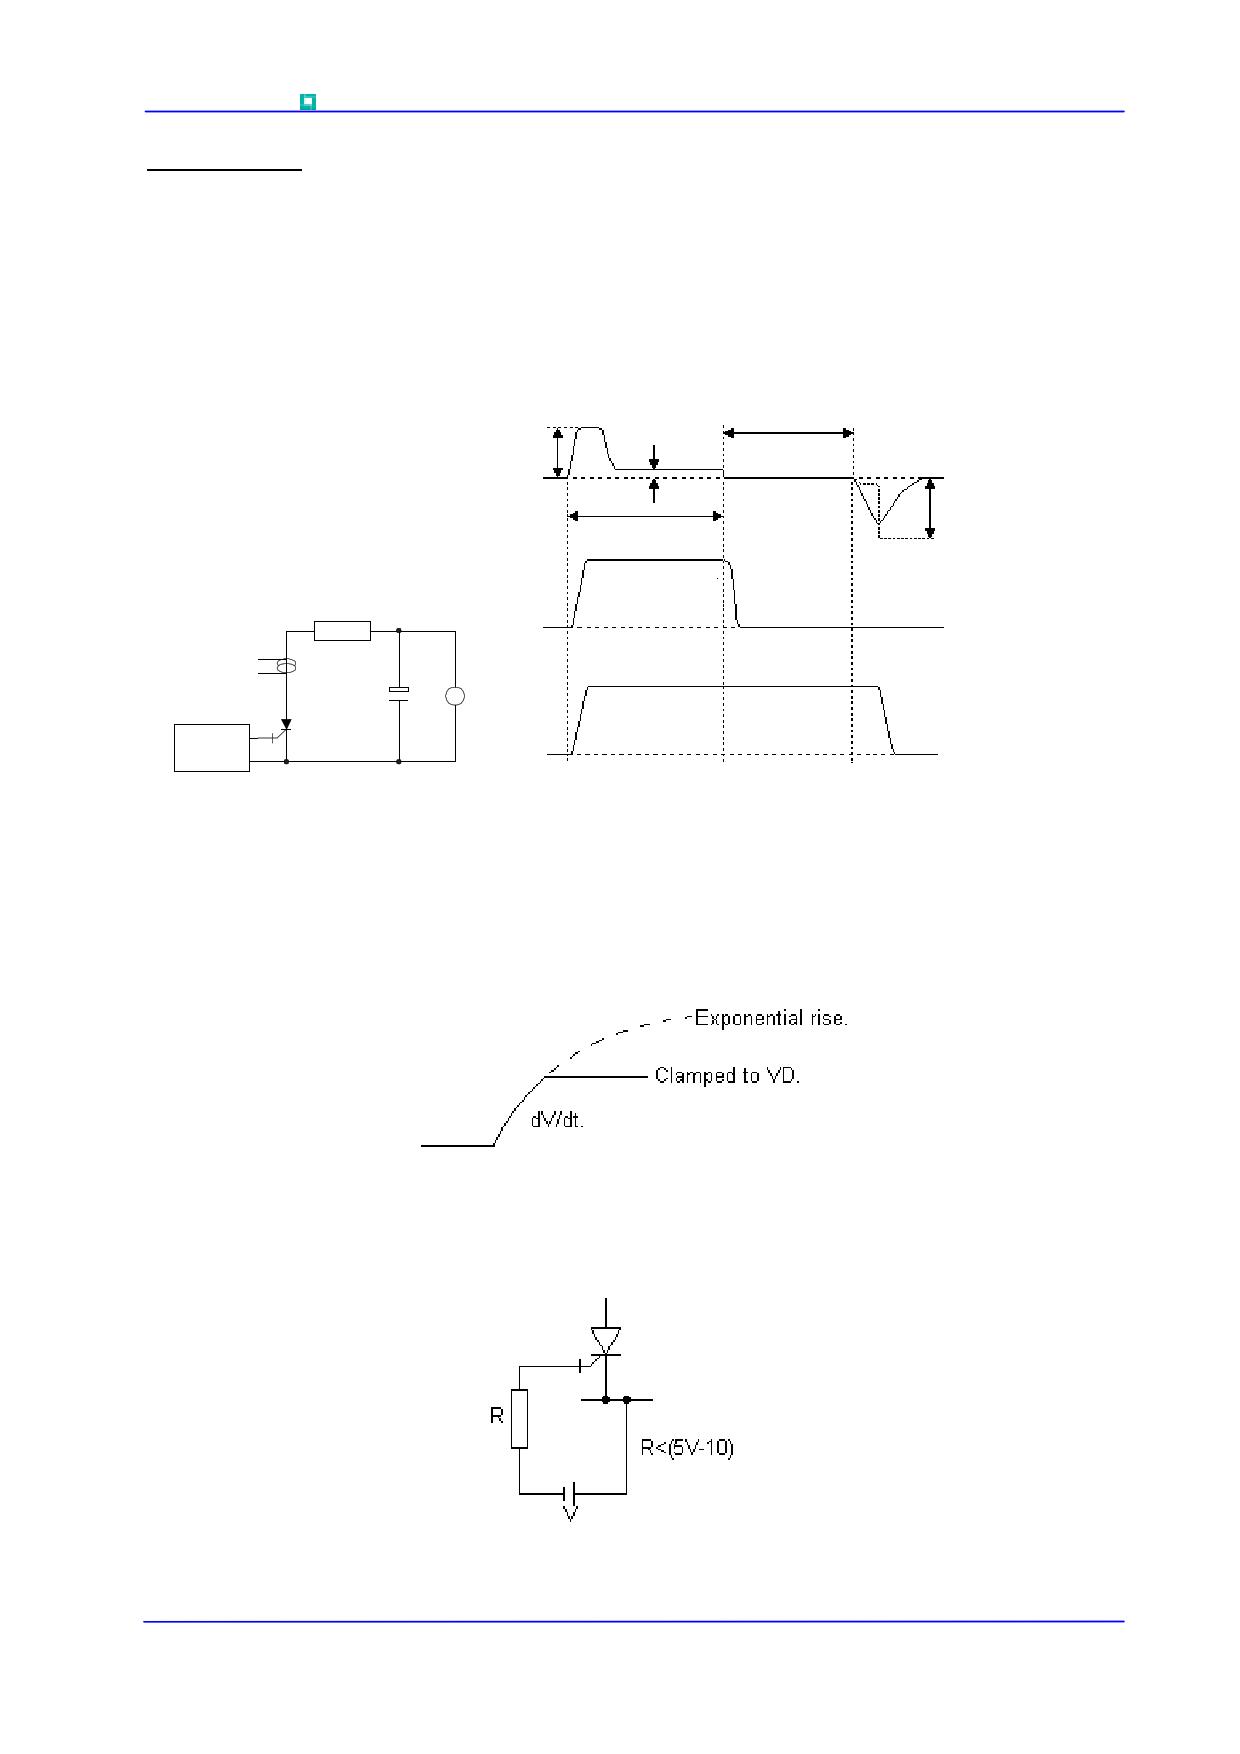 G1000LM250 pdf